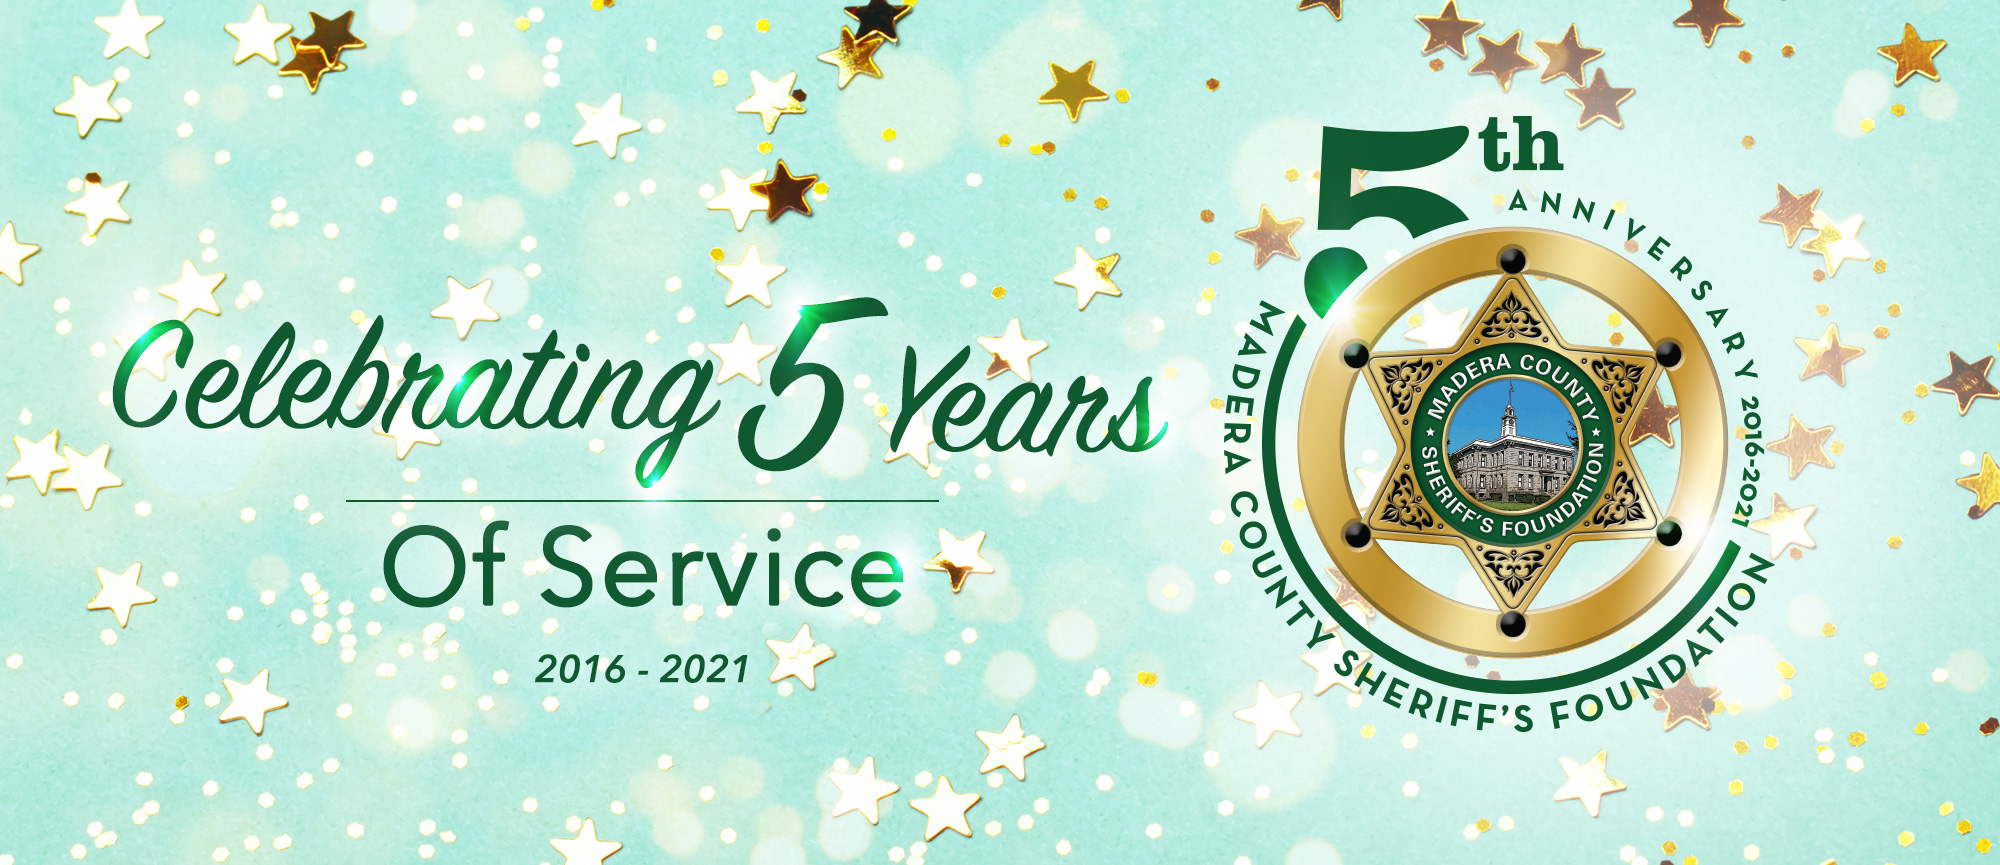 MSCF Celebrates its 5 year anniversary